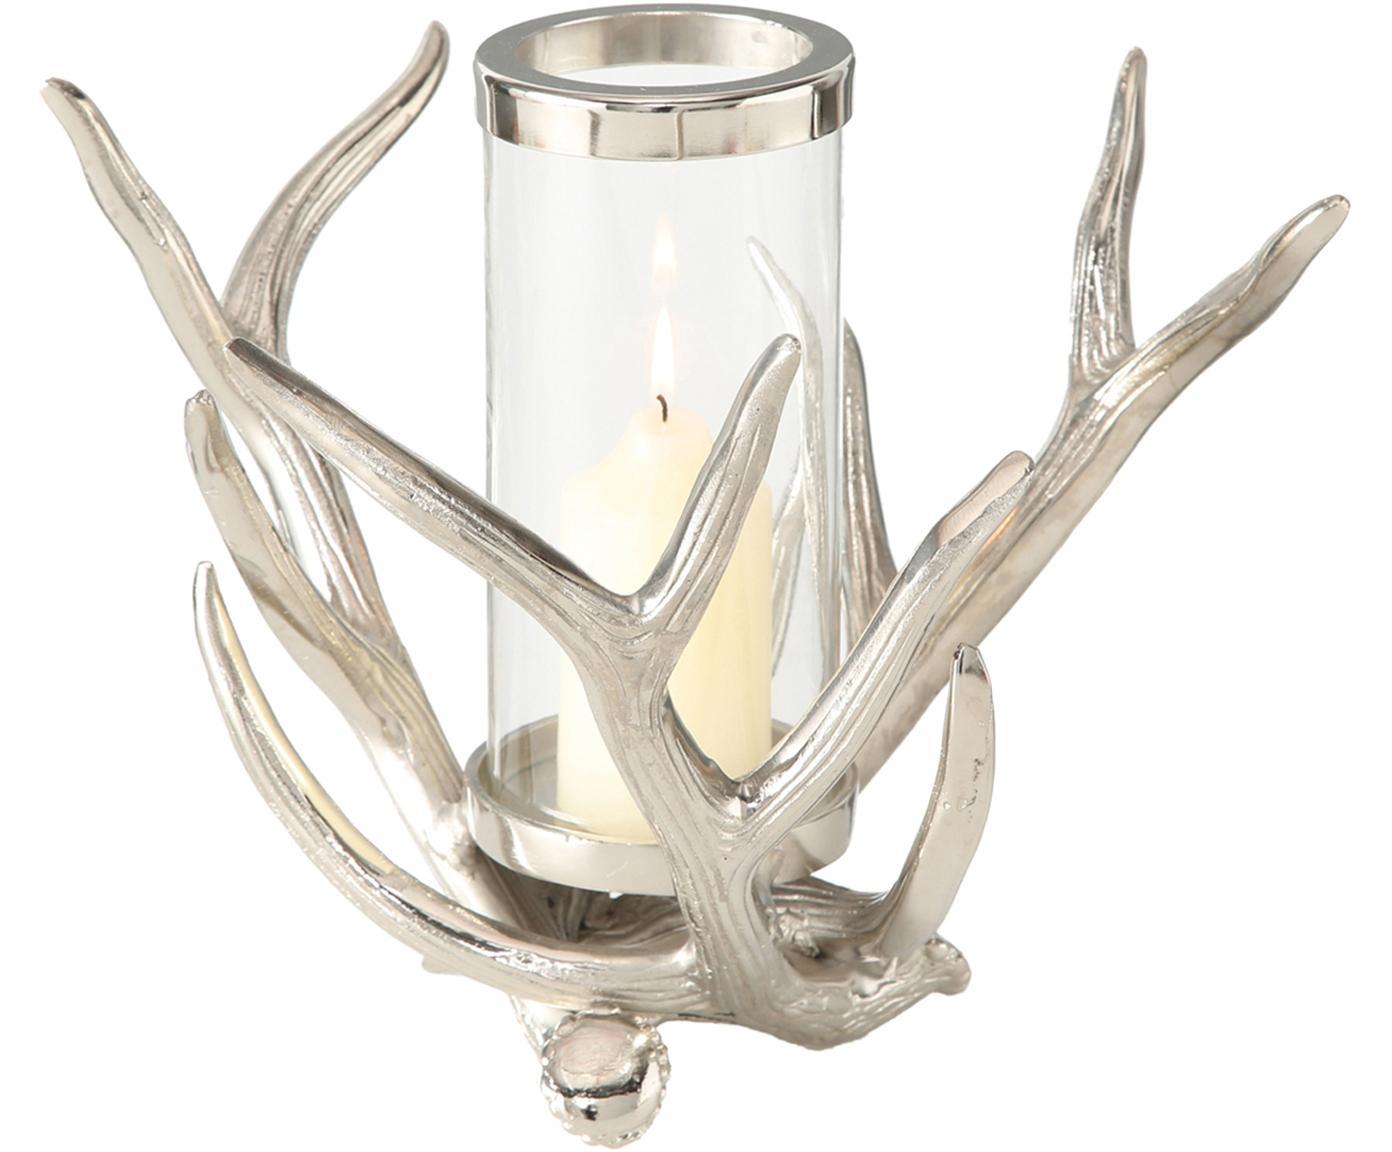 Windlichter Antlers, 2 Stück, Windlicht: Aluminium, Transparent, Aluminium, 33 x 25 cm